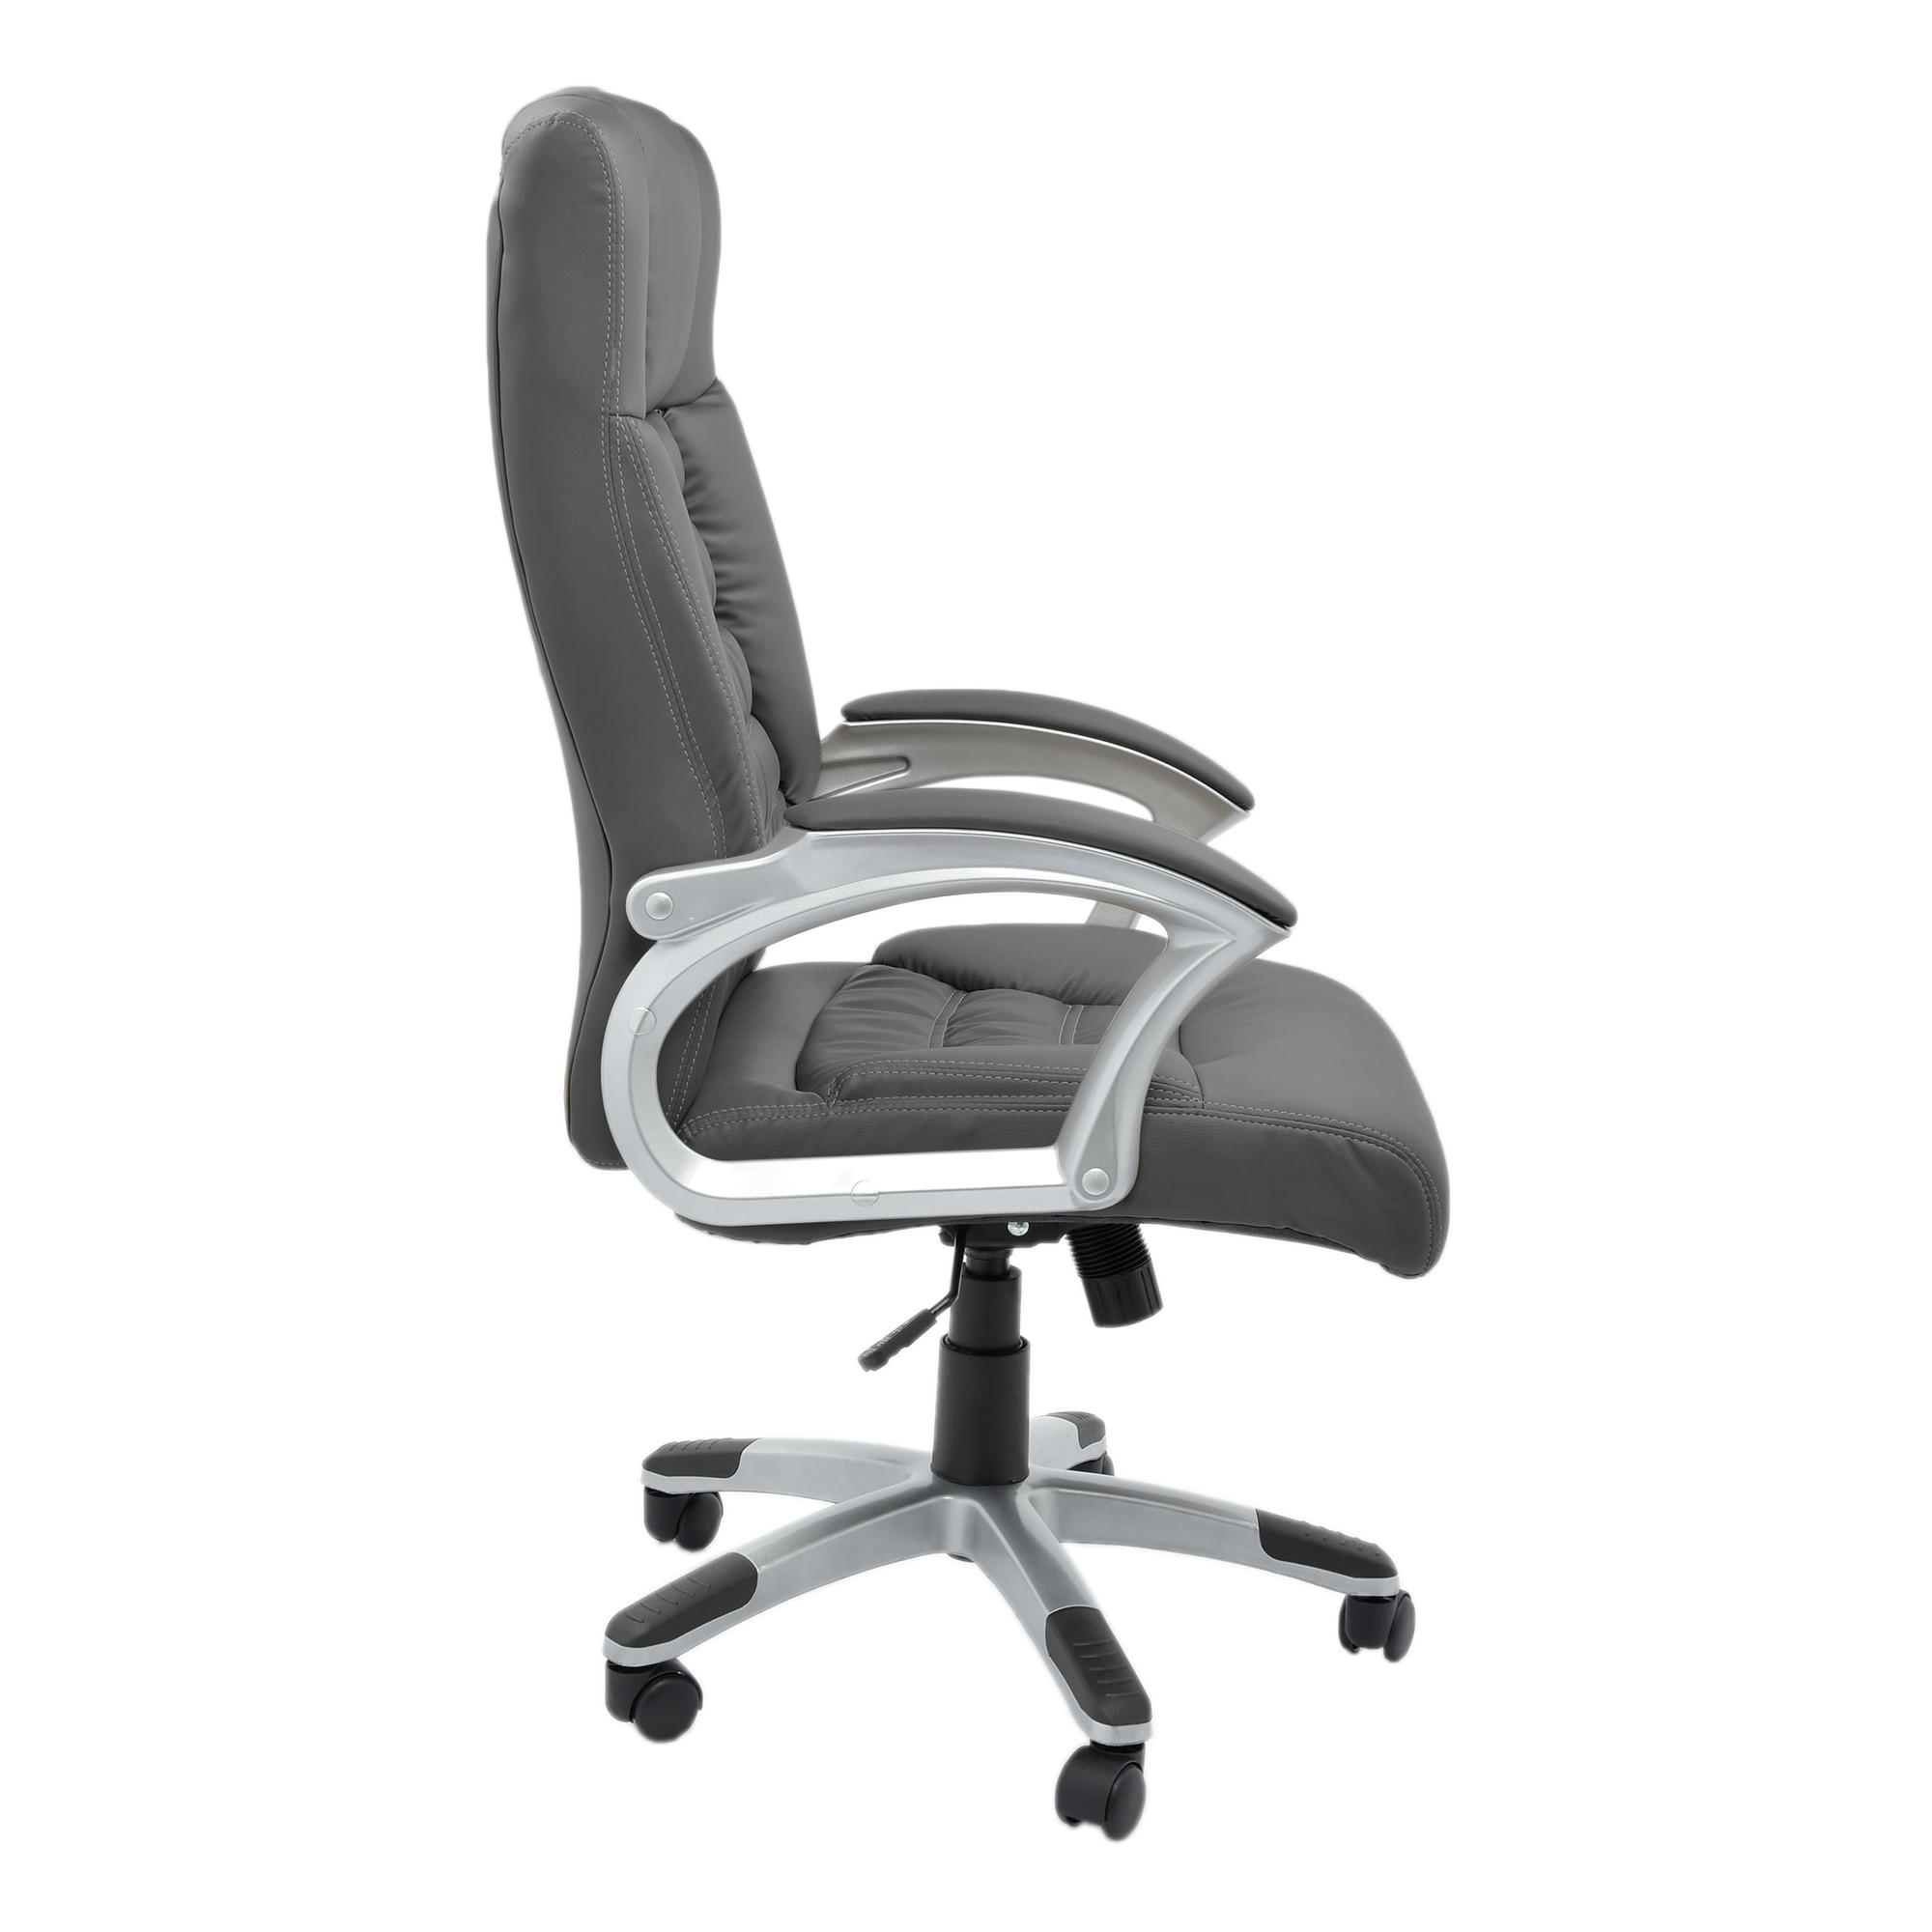 Kring Bokai Ergonomikus irodai szék, Műbőr, Világosszürke eMAG.hu